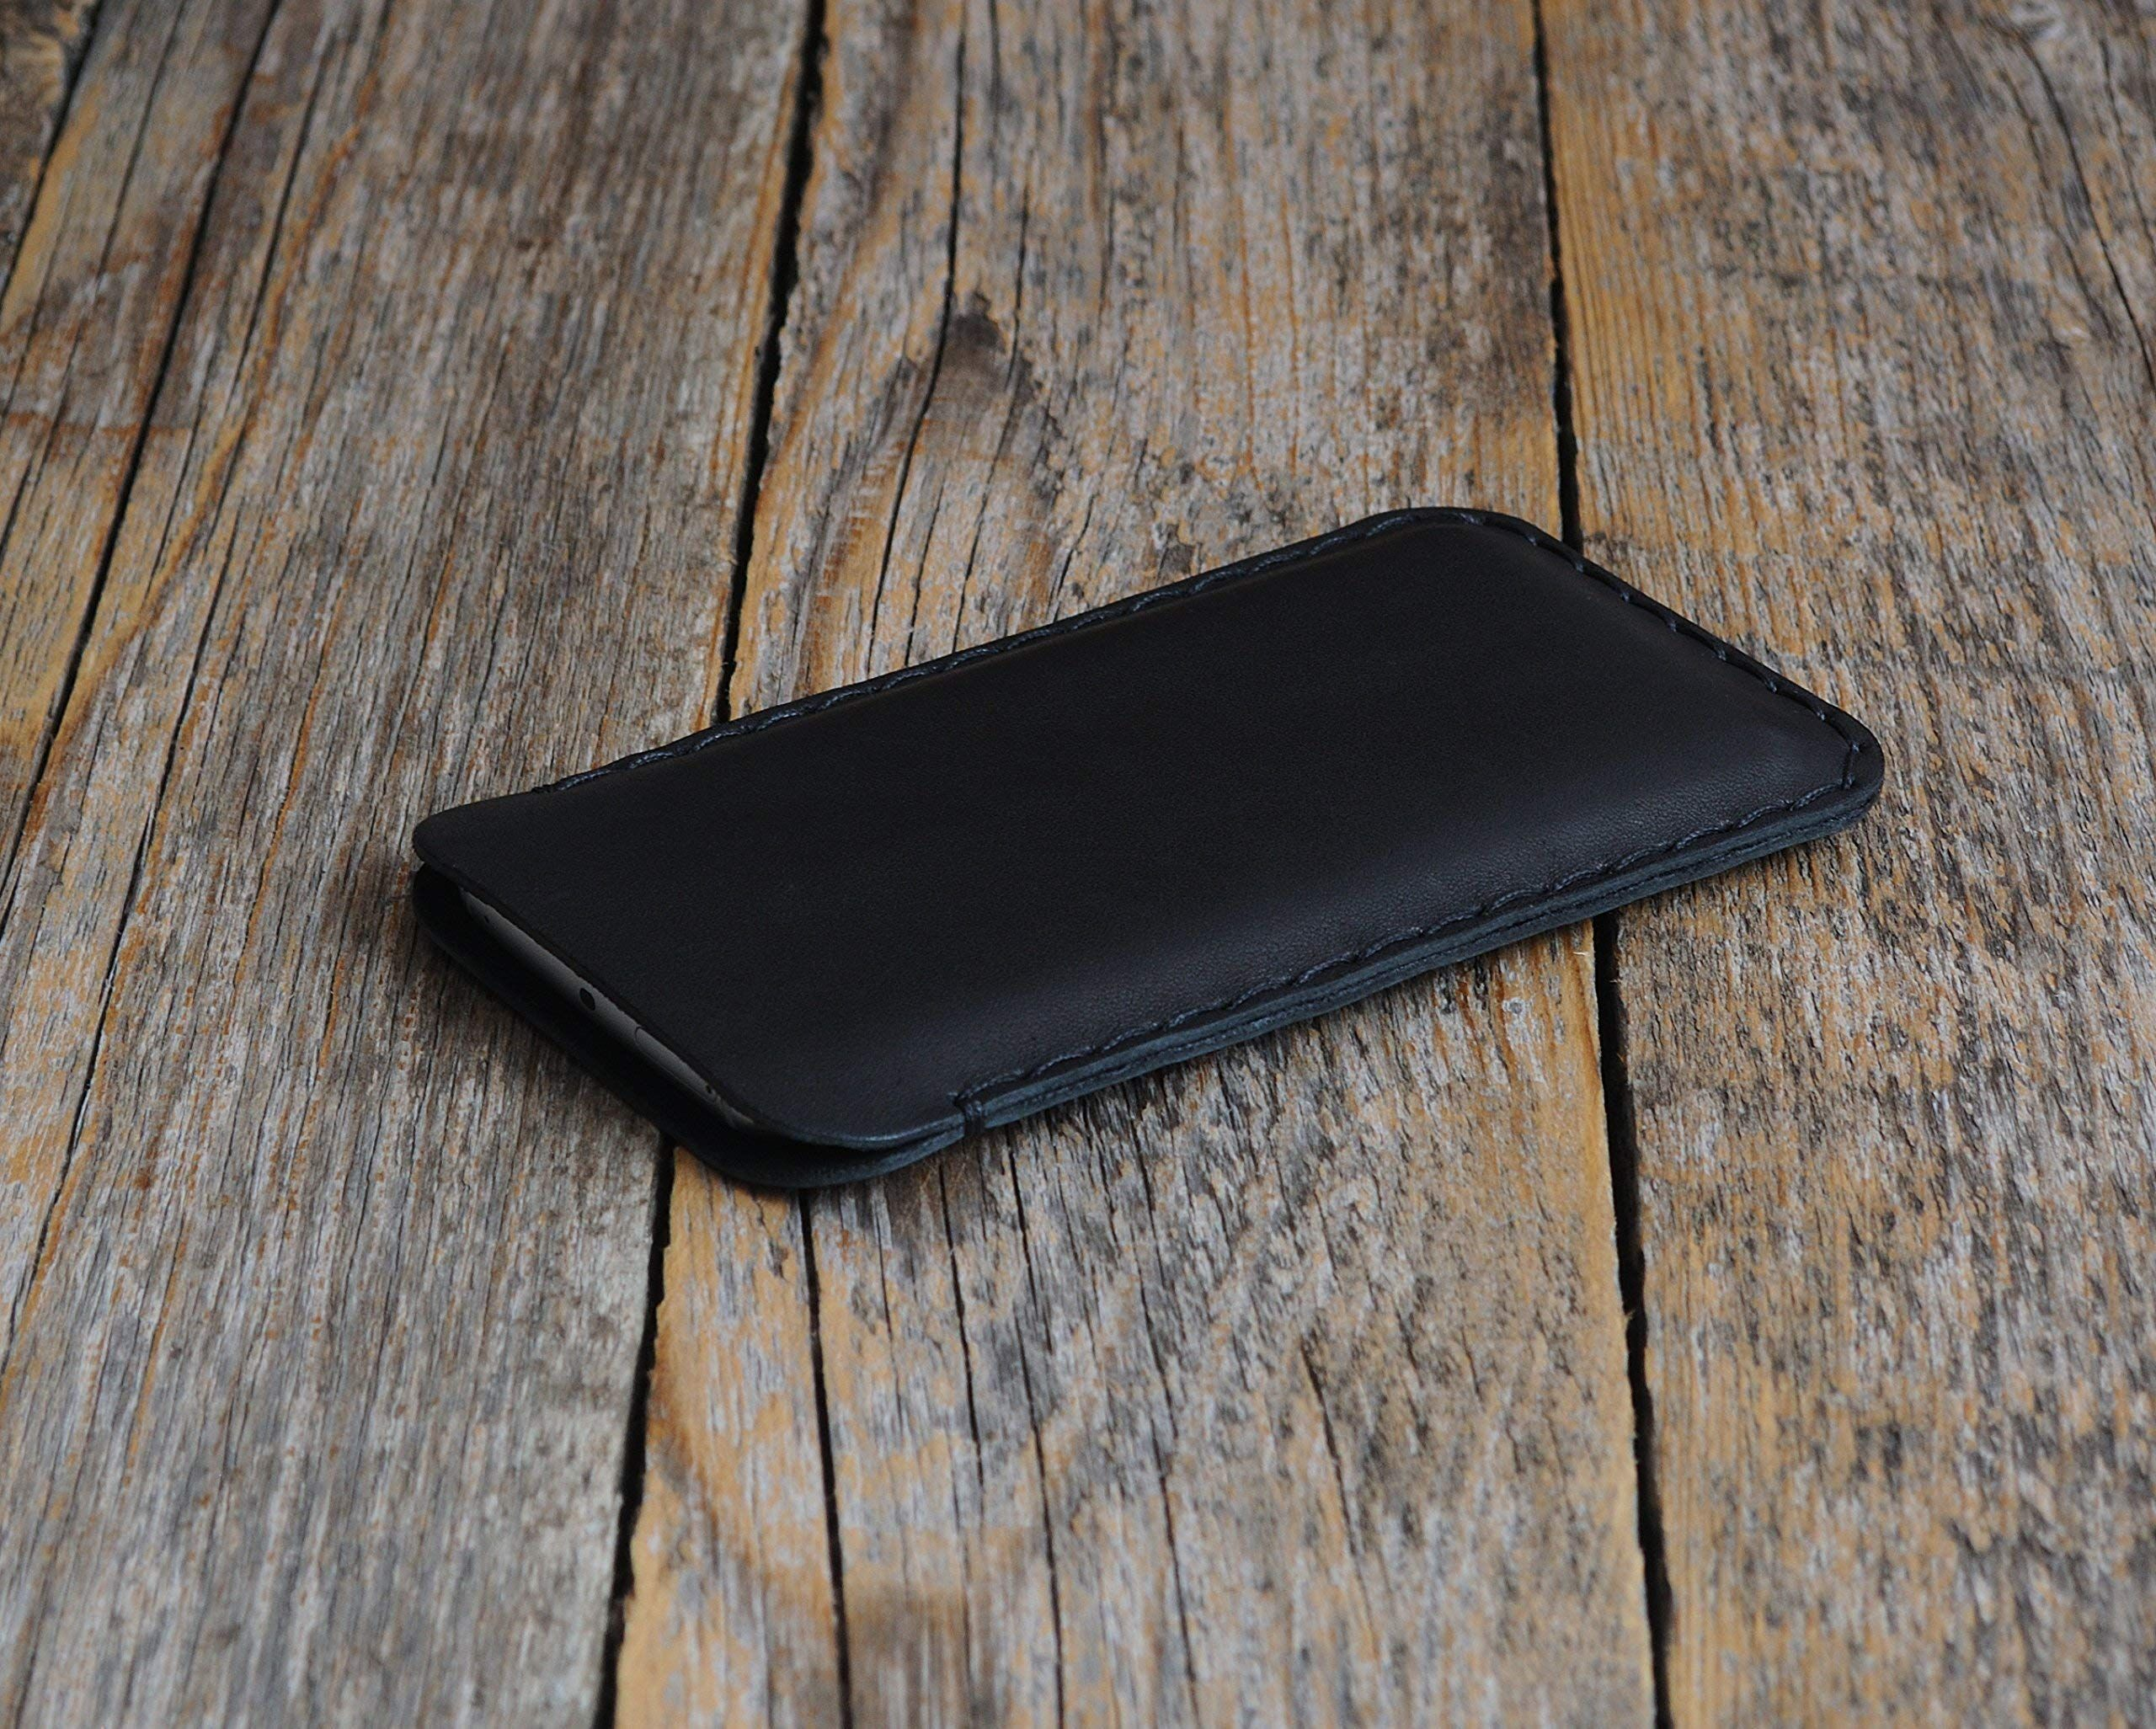 Funda de cuero para iPhone XR caja bolsa case cover estuche de manga